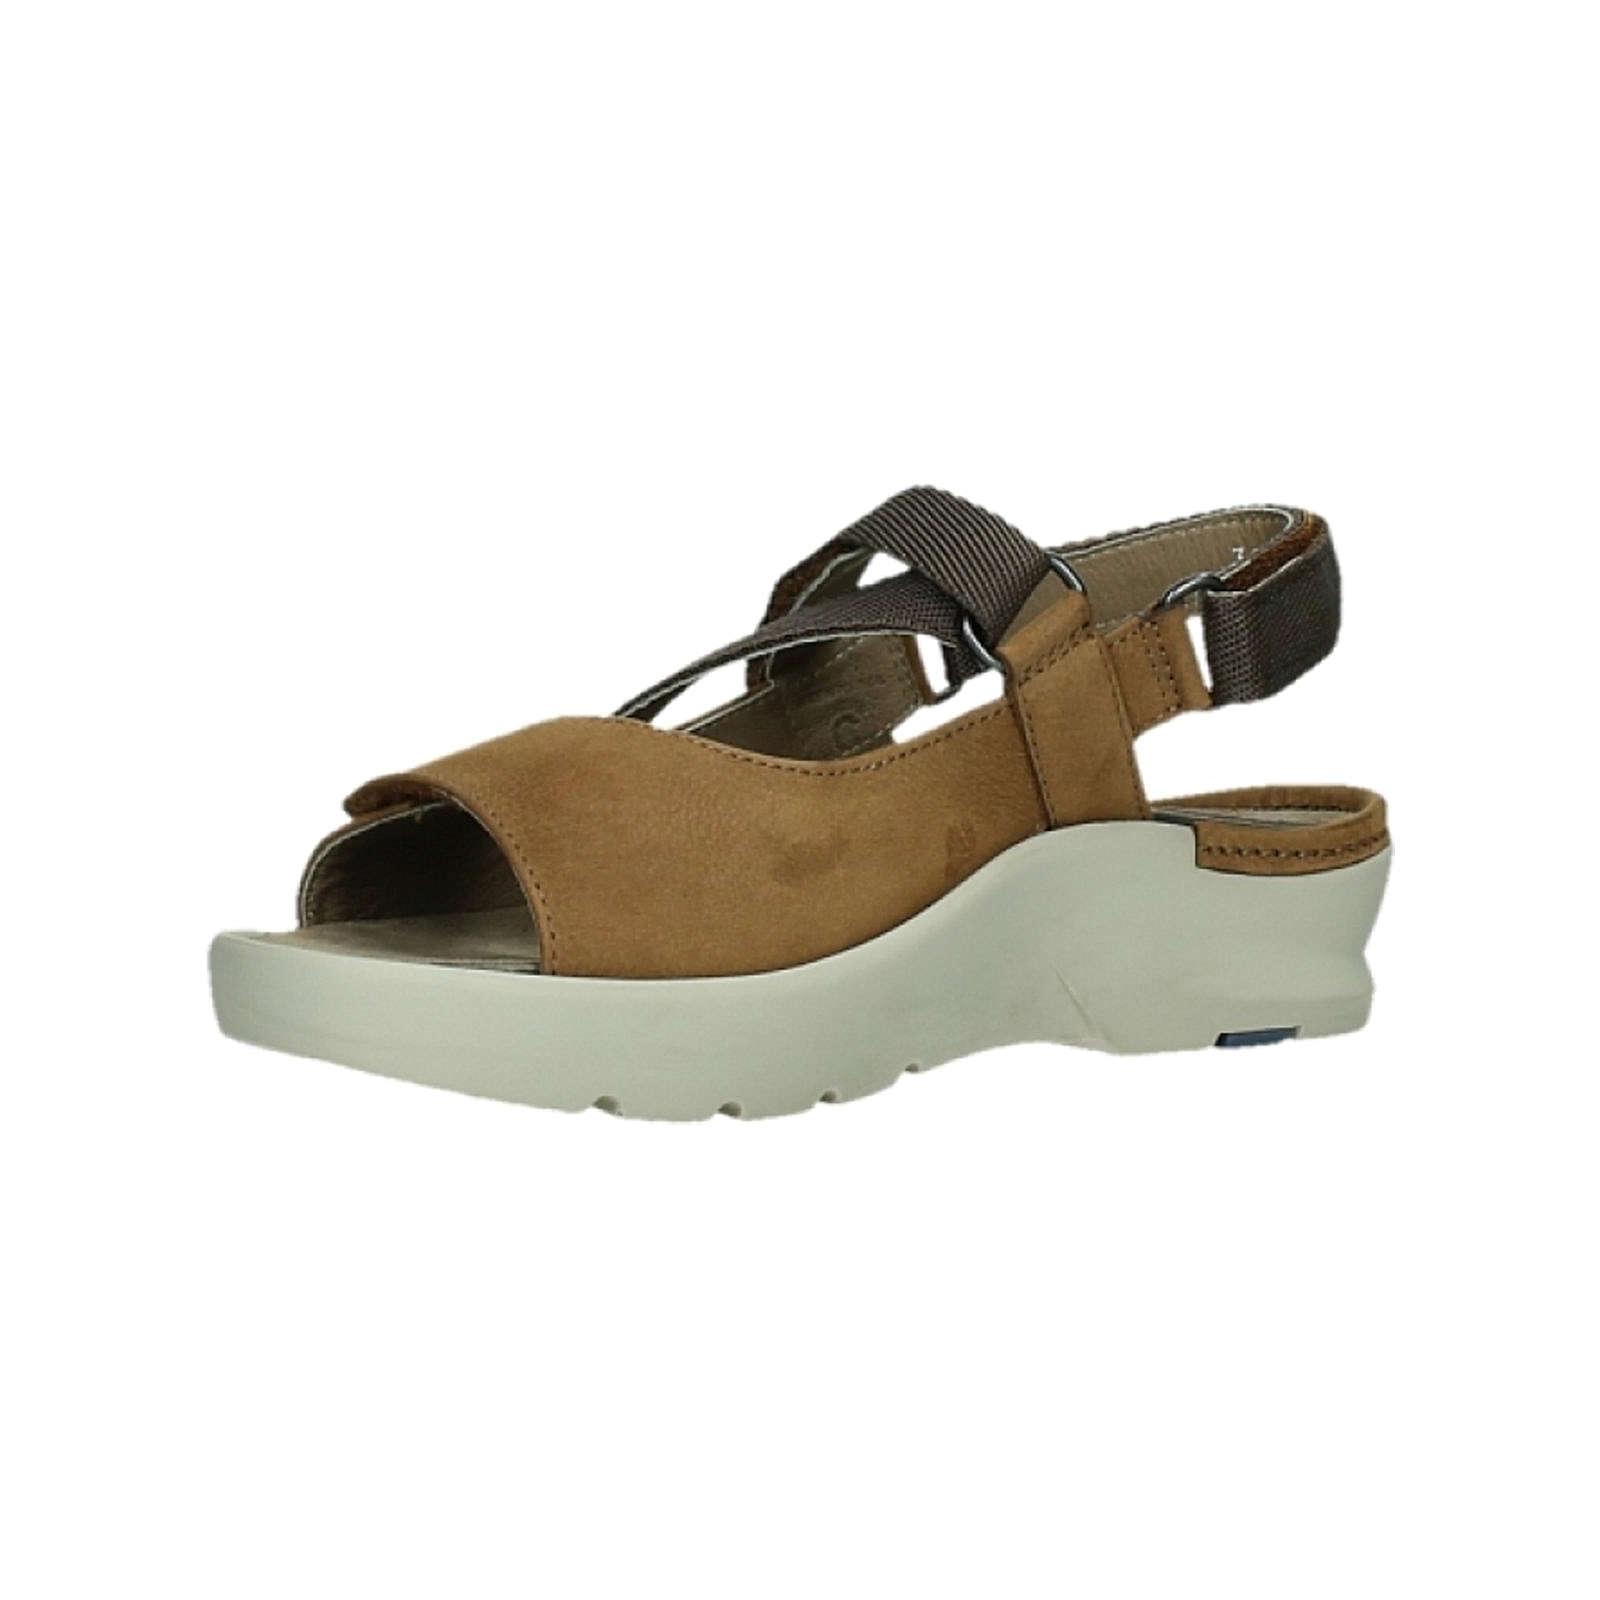 Wolky Sandalen Klassische Sandalen braun Damen Gr. 38